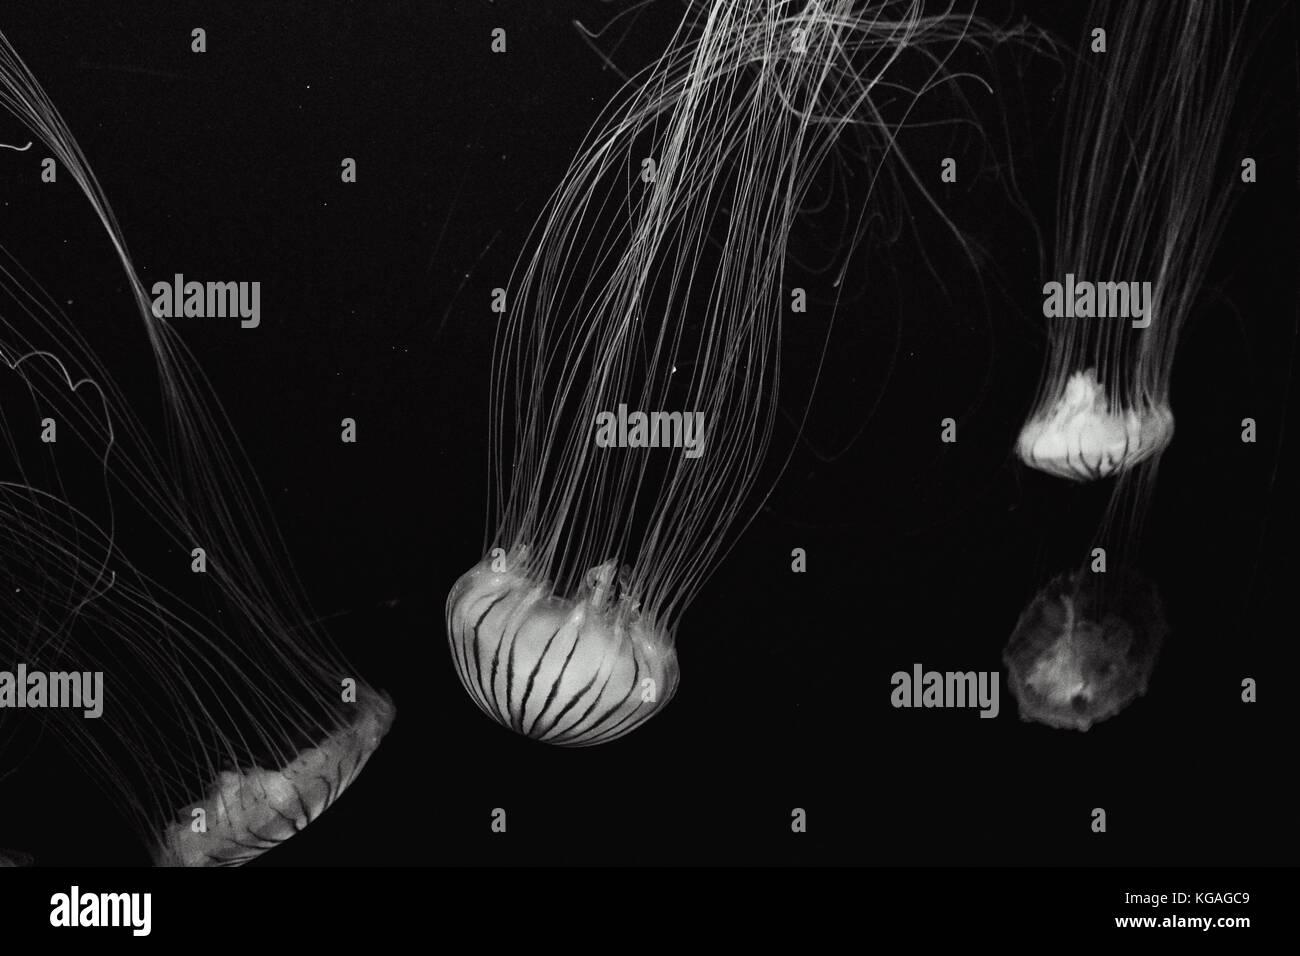 Jellyfish at San Francisco's Aquarium of the Bay - Stock Image